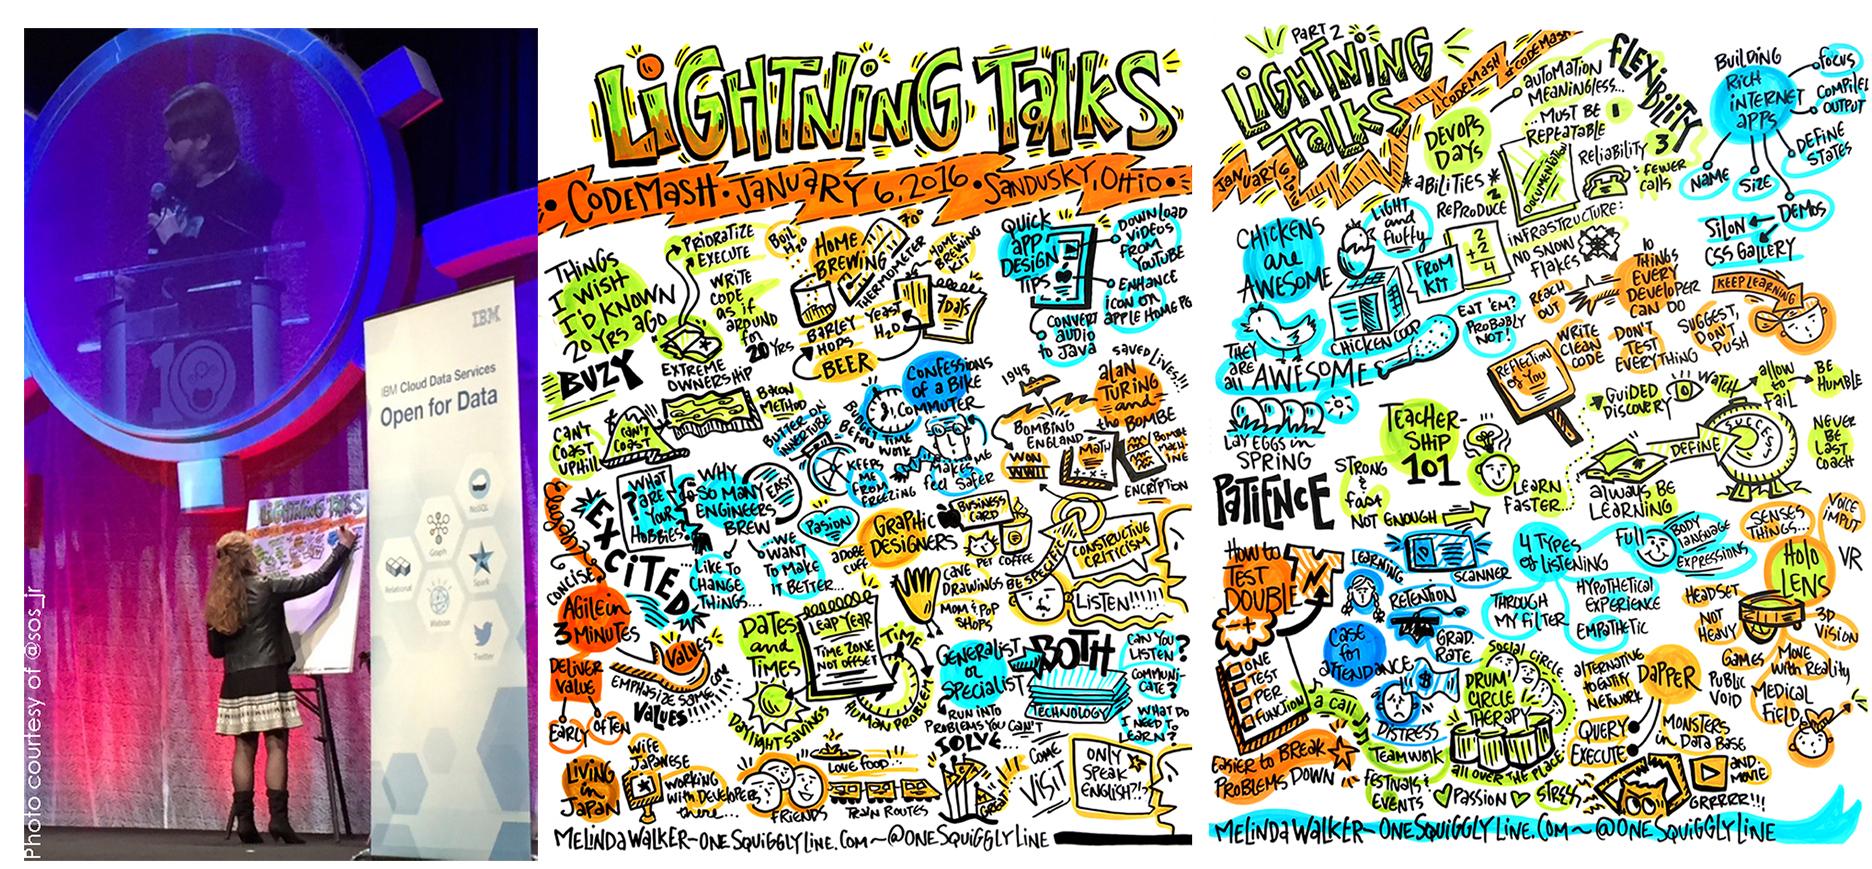 Graphic Recording - Ligntning Talks at CodeMash